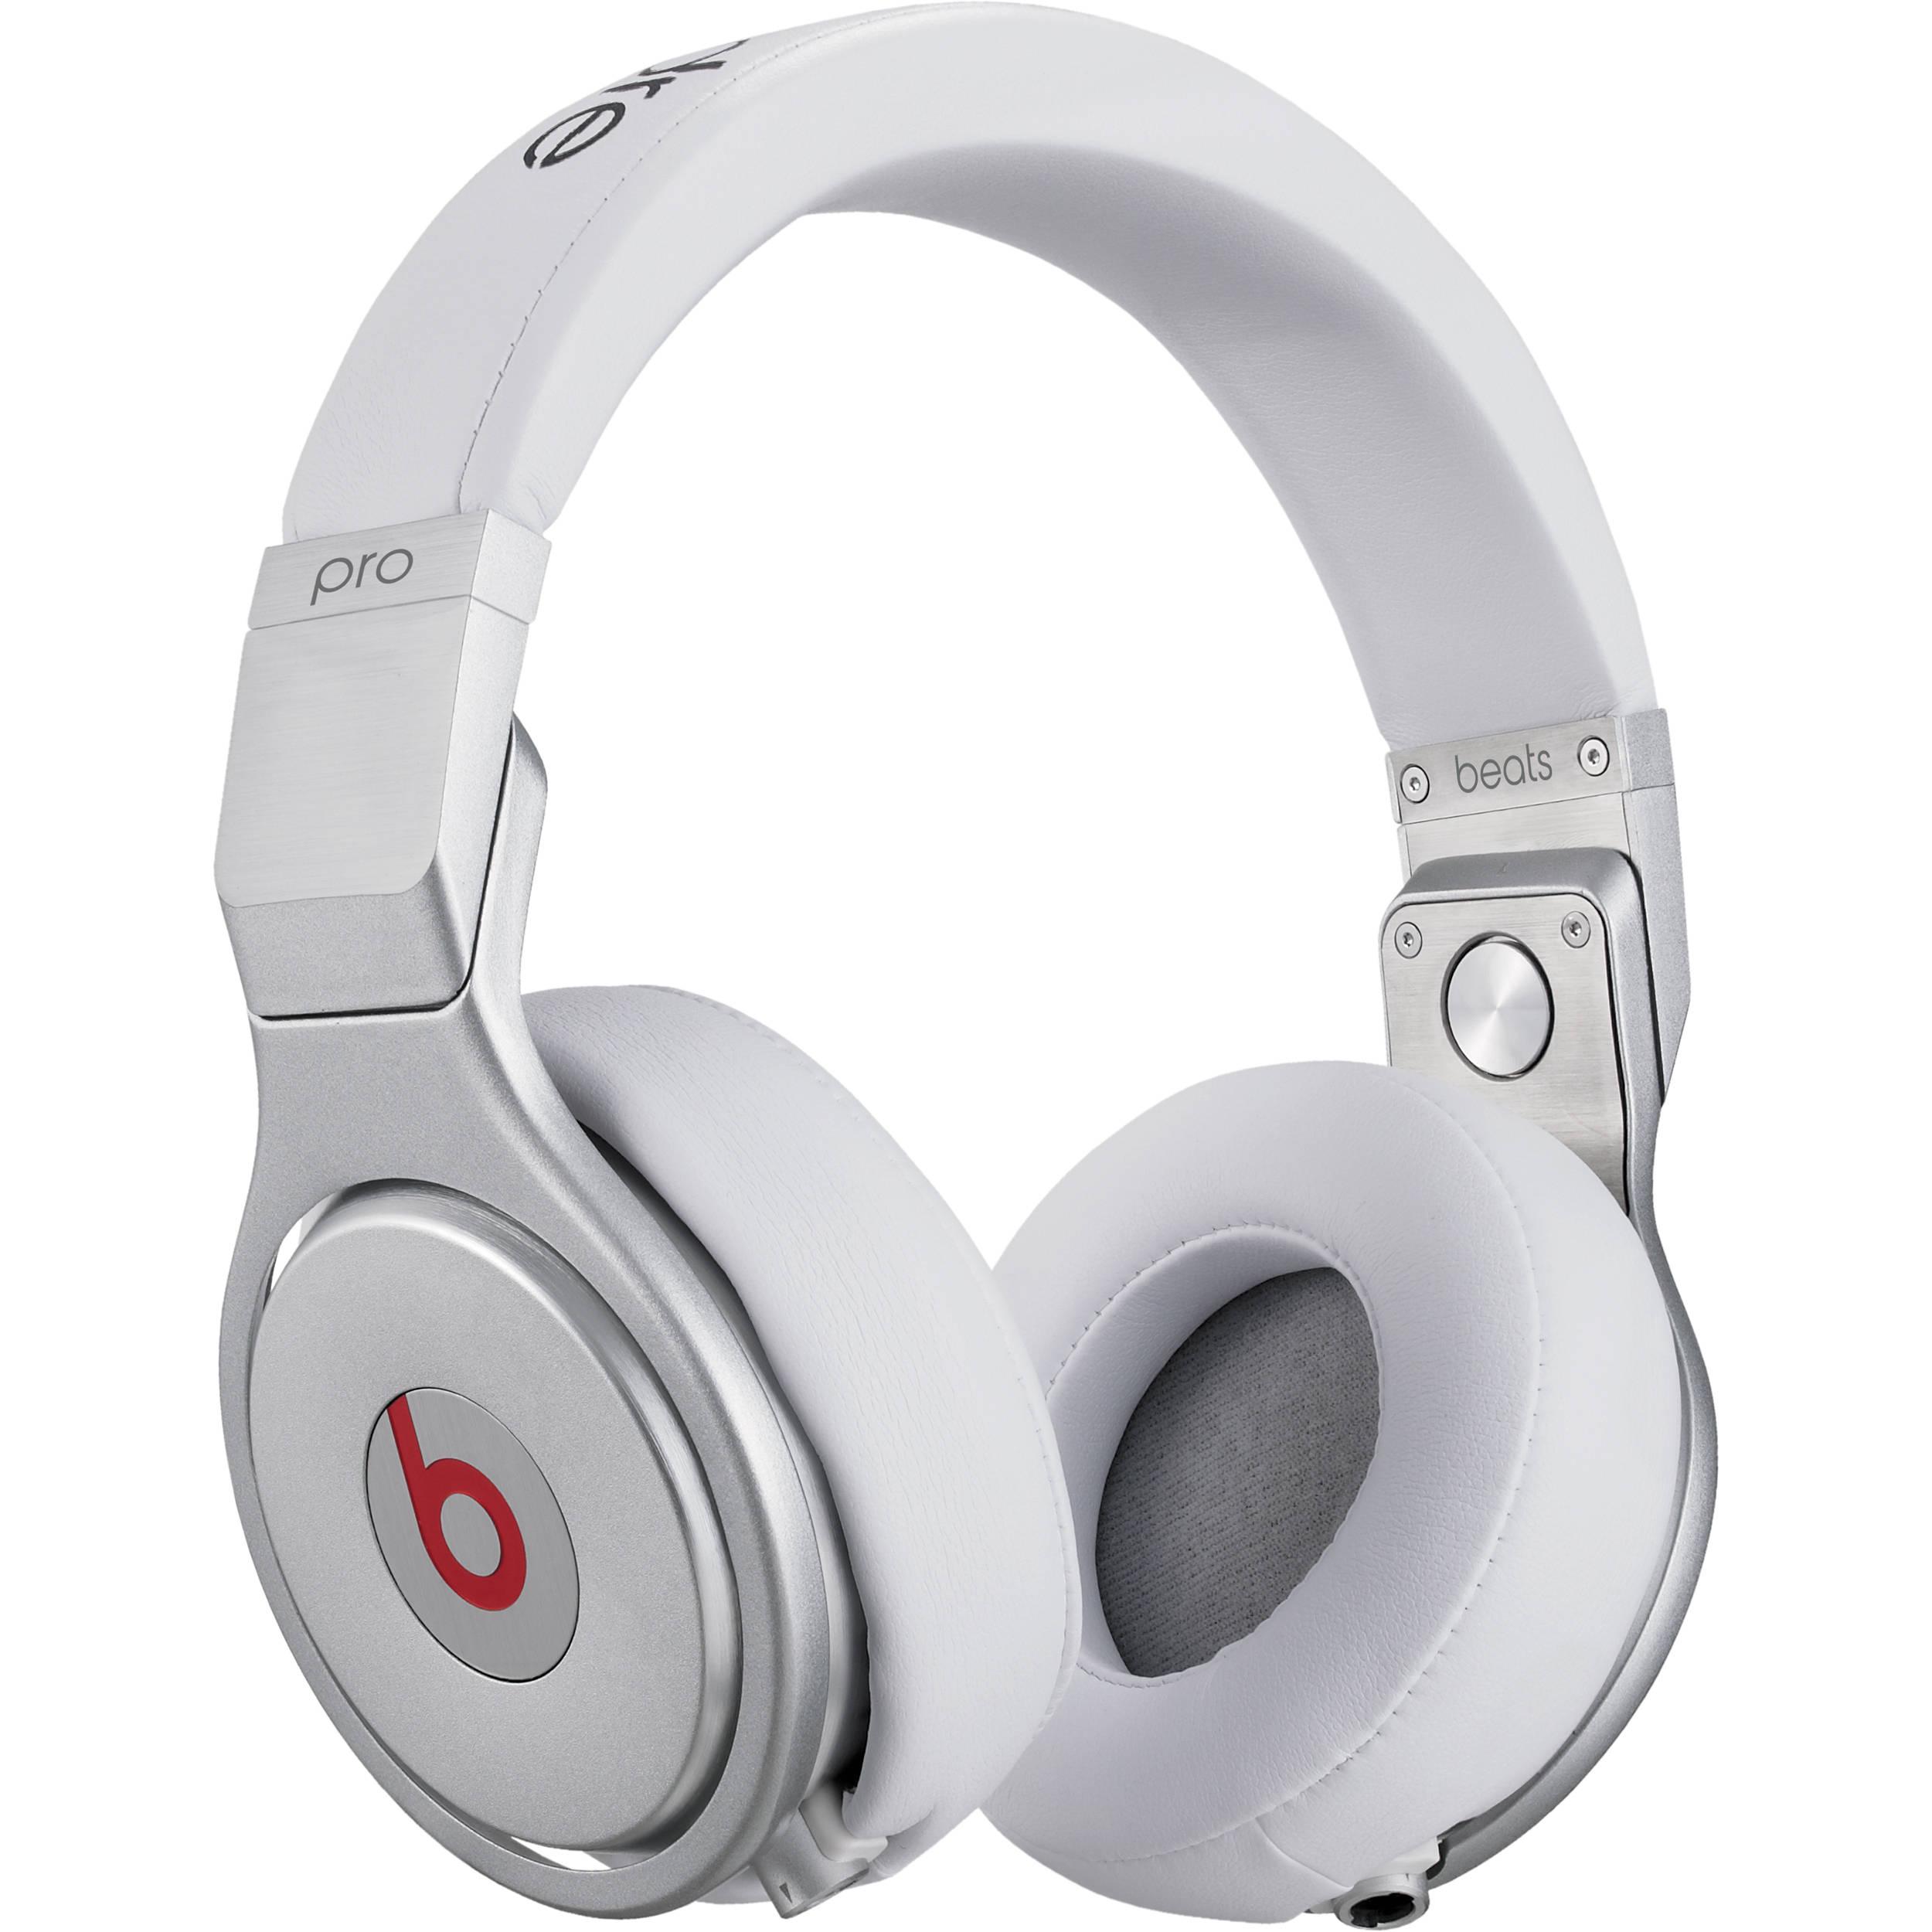 Beats By Dr Dre Pro High Performance Studio Mh6q2am A B H